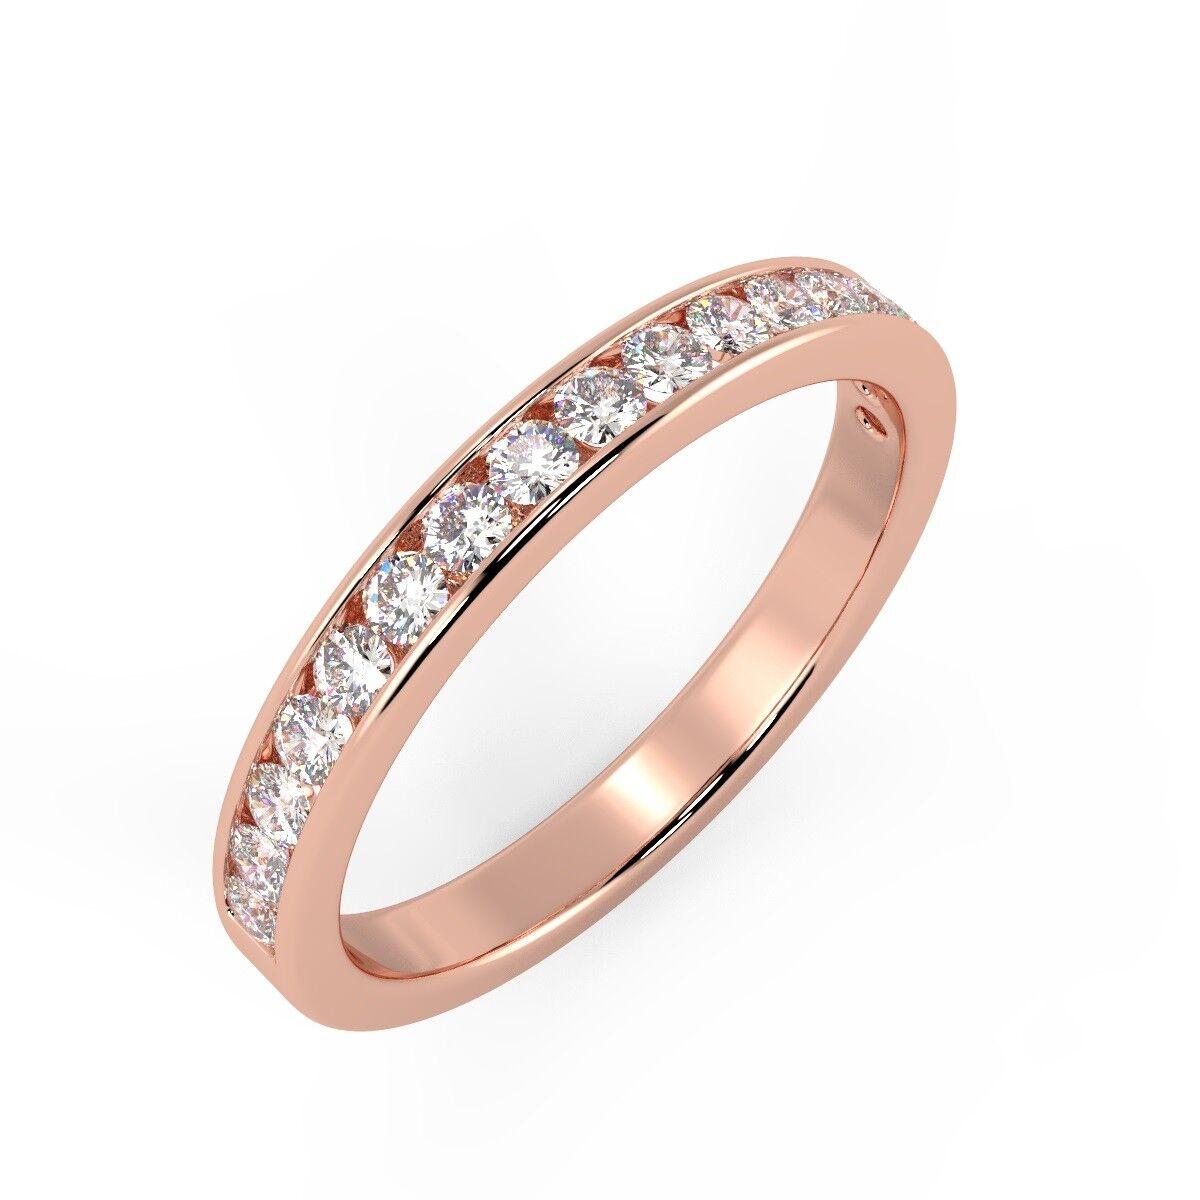 0.25 Carat Round Diamond Channel Set Half Eternity Ring, 9k pink gold